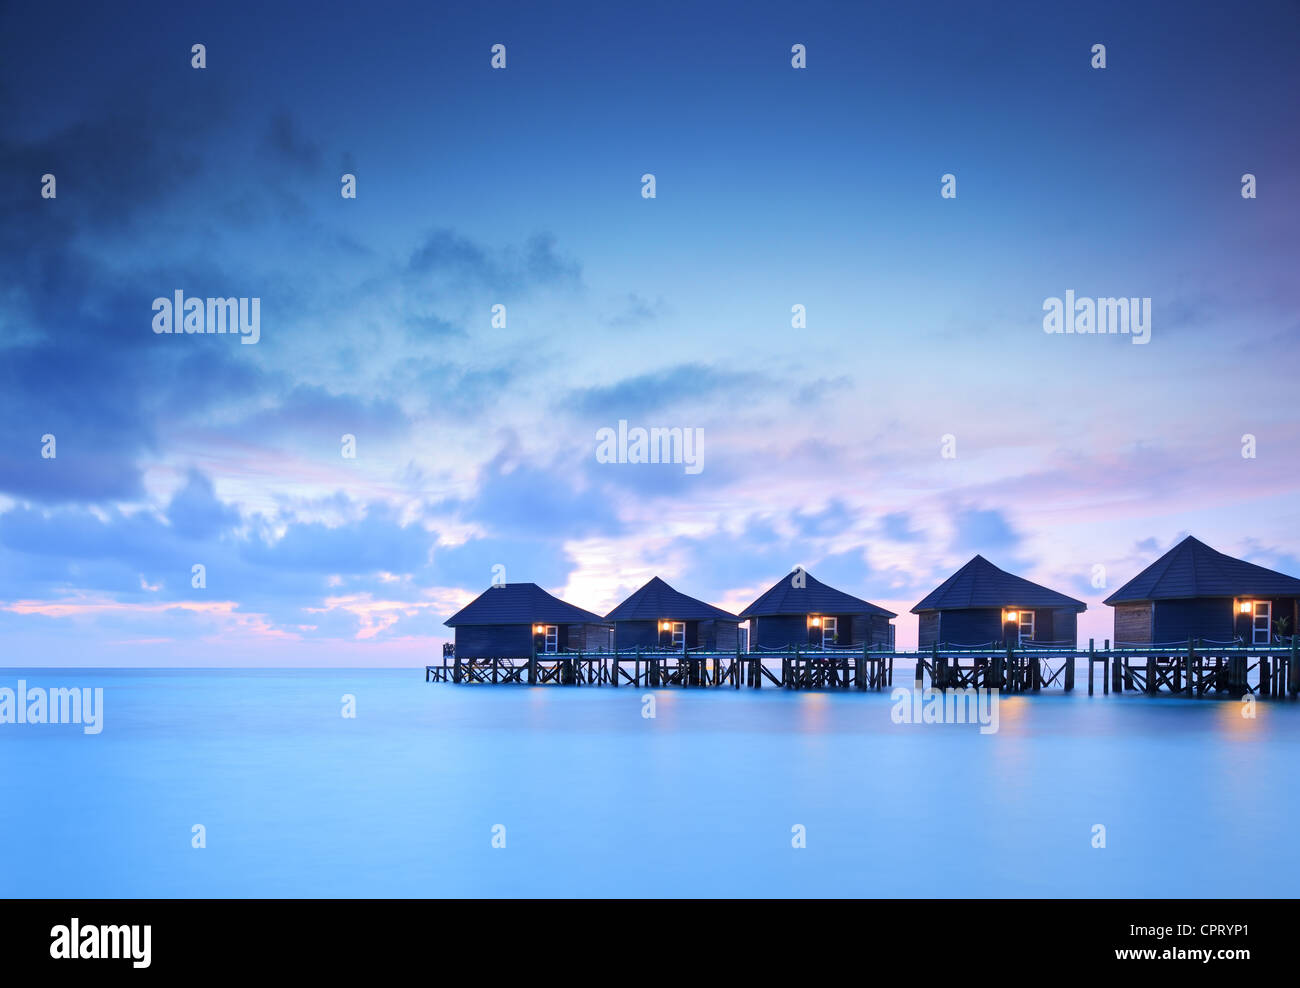 Cabañas Villa del agua al atardecer en la isla de Kuredu LHAVIYANI ATOLL, Maldivas, Imagen De Stock